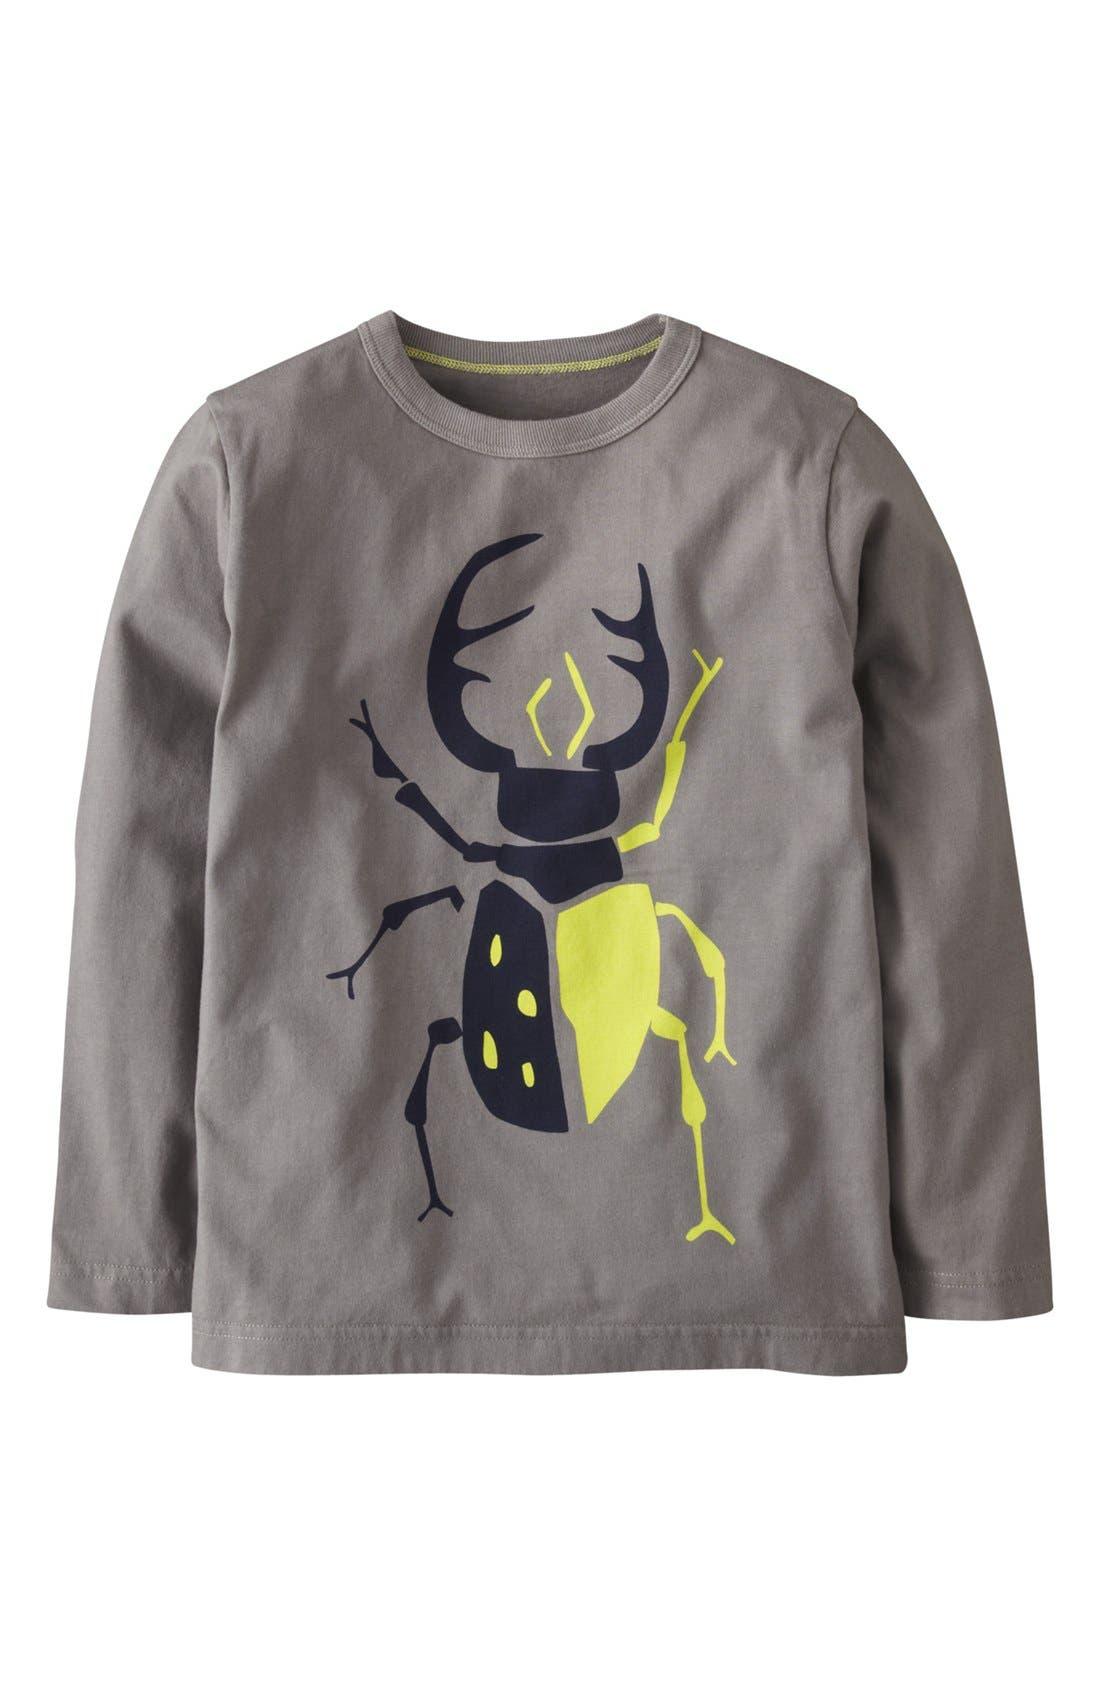 Alternate Image 1 Selected - Mini Boden 'Big Bugs' Long Sleeve T-Shirt (Toddler Boys)